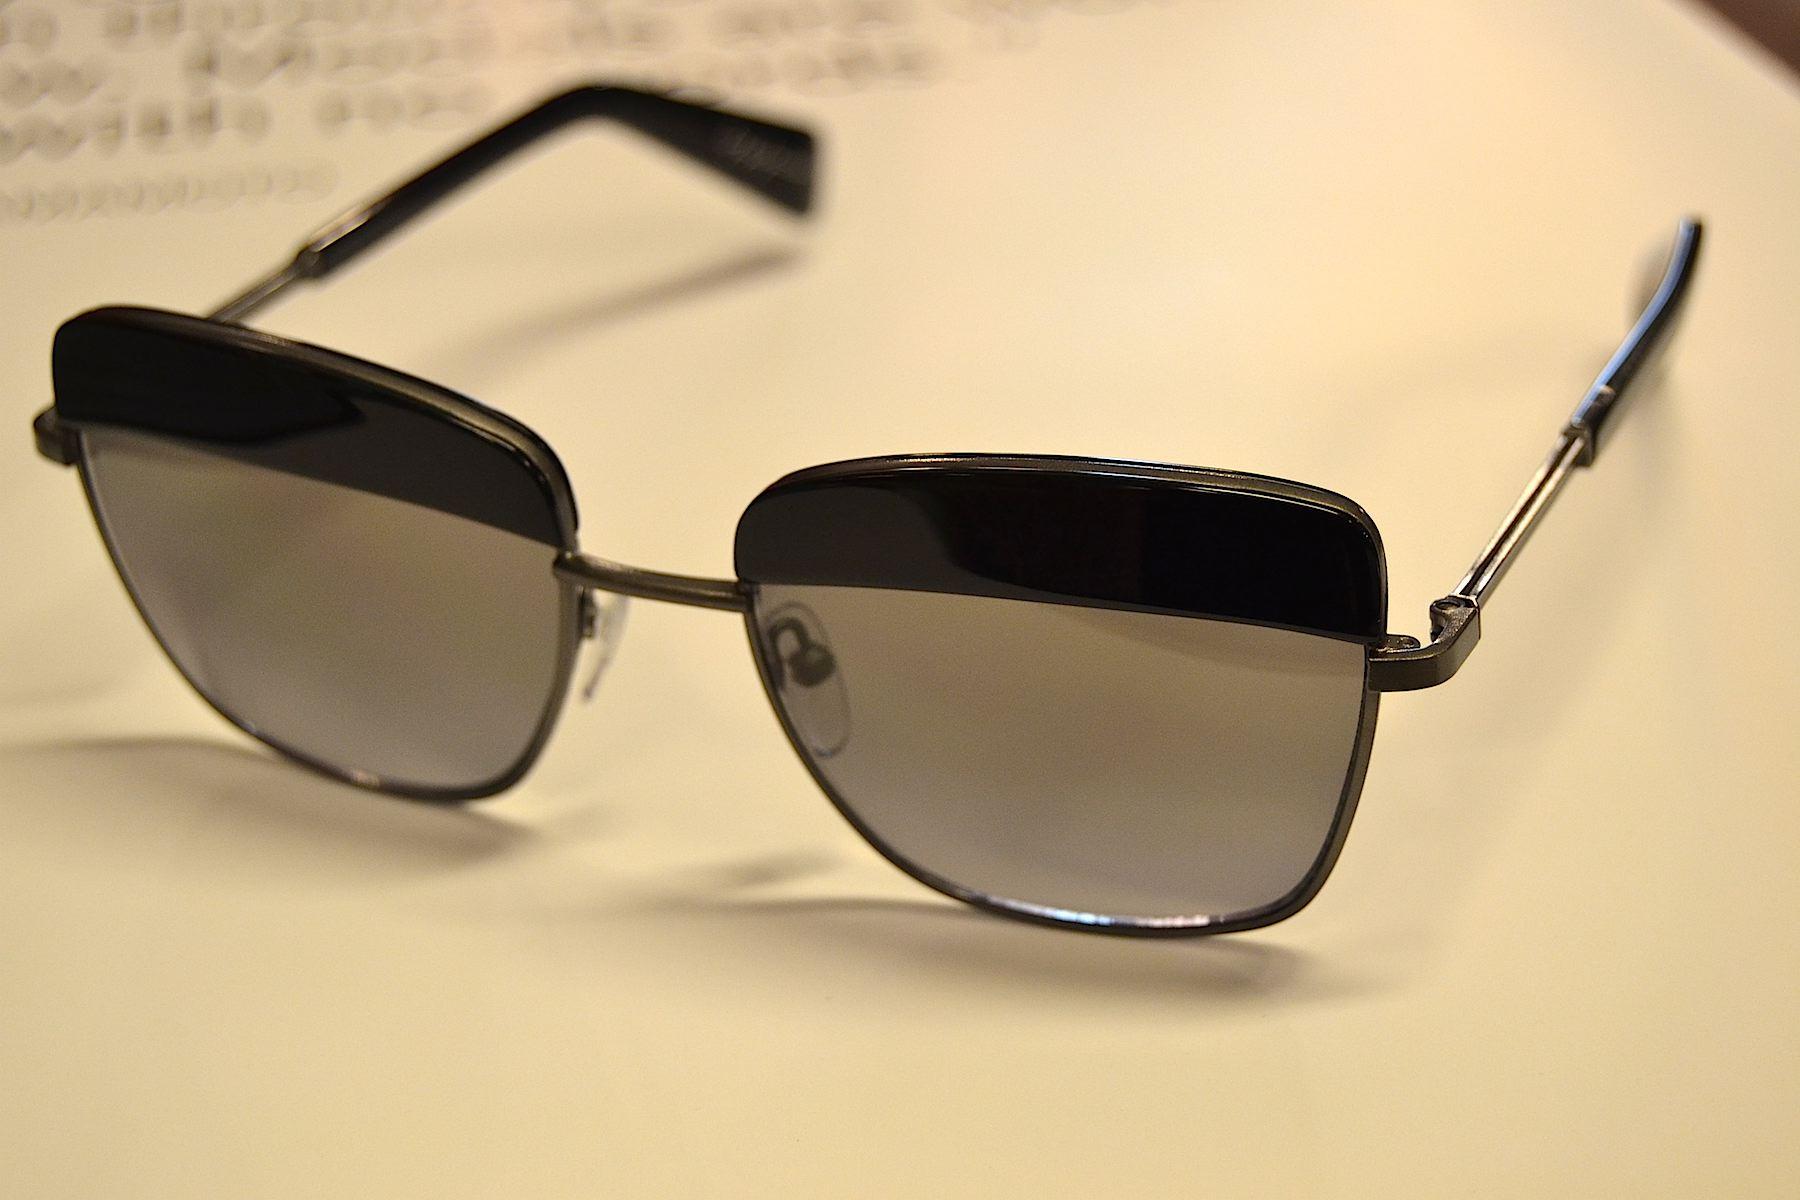 lenastore-bergamo-lenafashion-shop-online-yohji-yamamoto-gli-occhiali-sunglasses-17